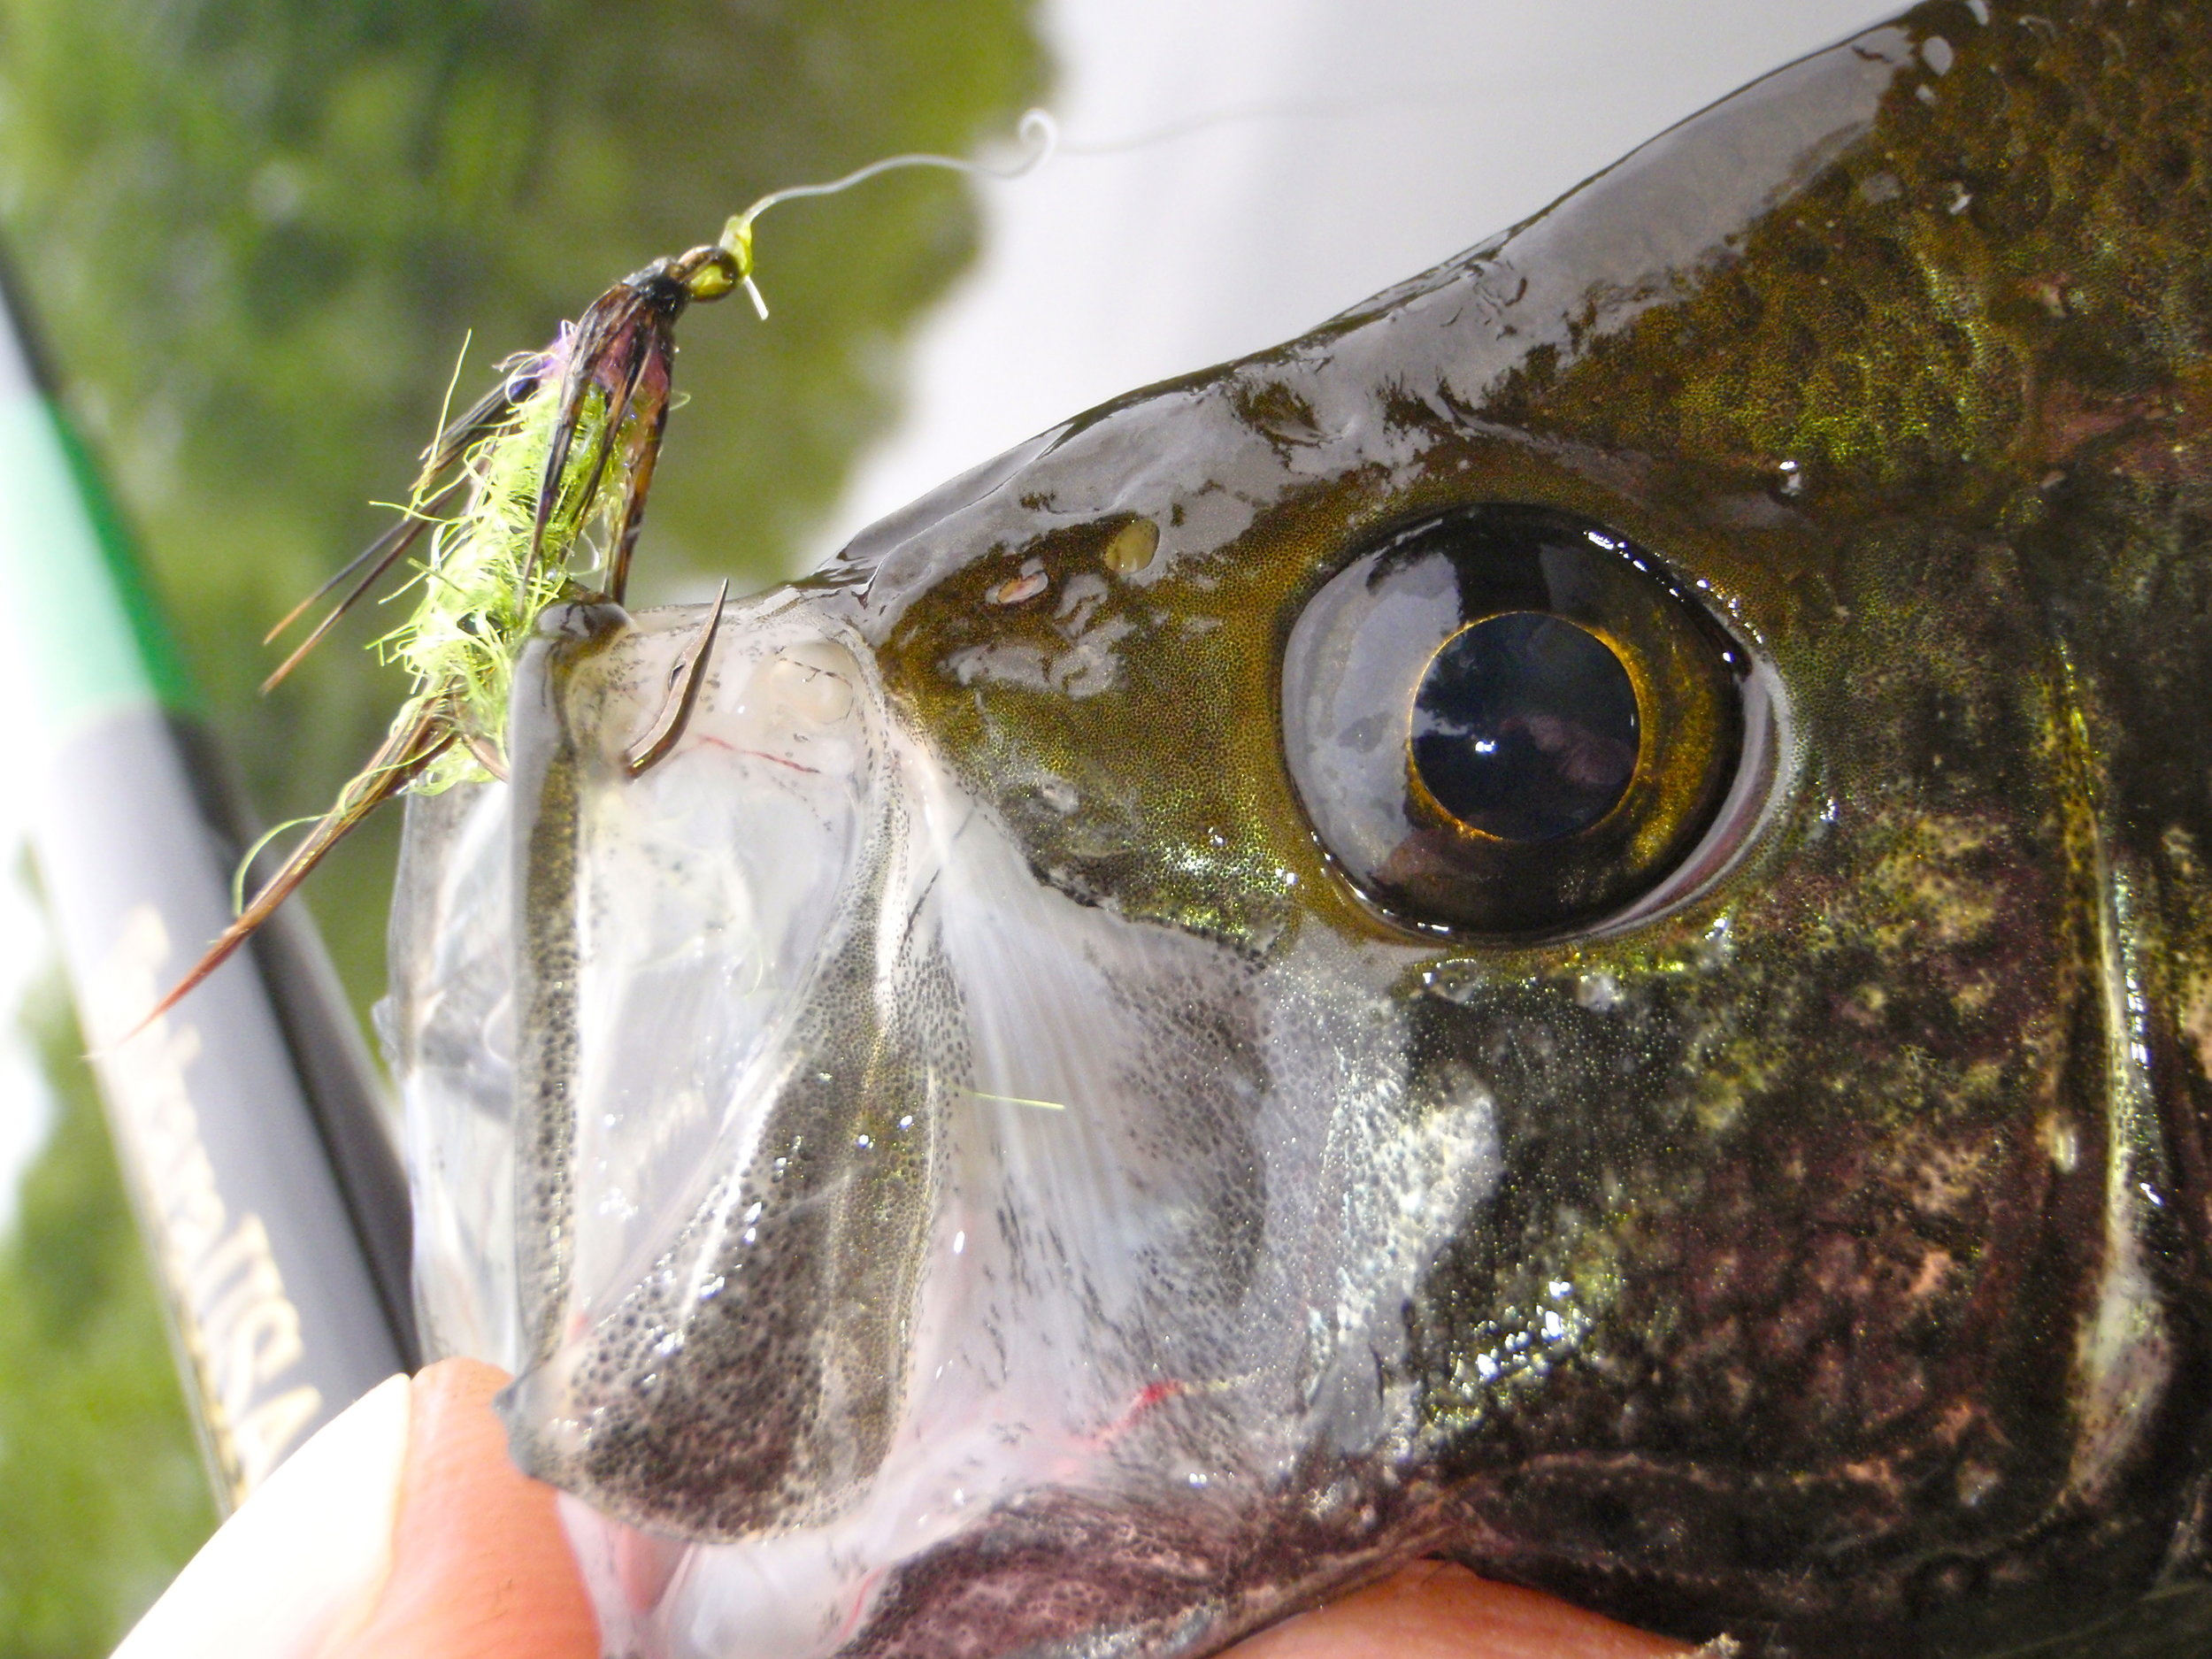 Soft hackles do a great job imitating aquatic insects and small baitfish